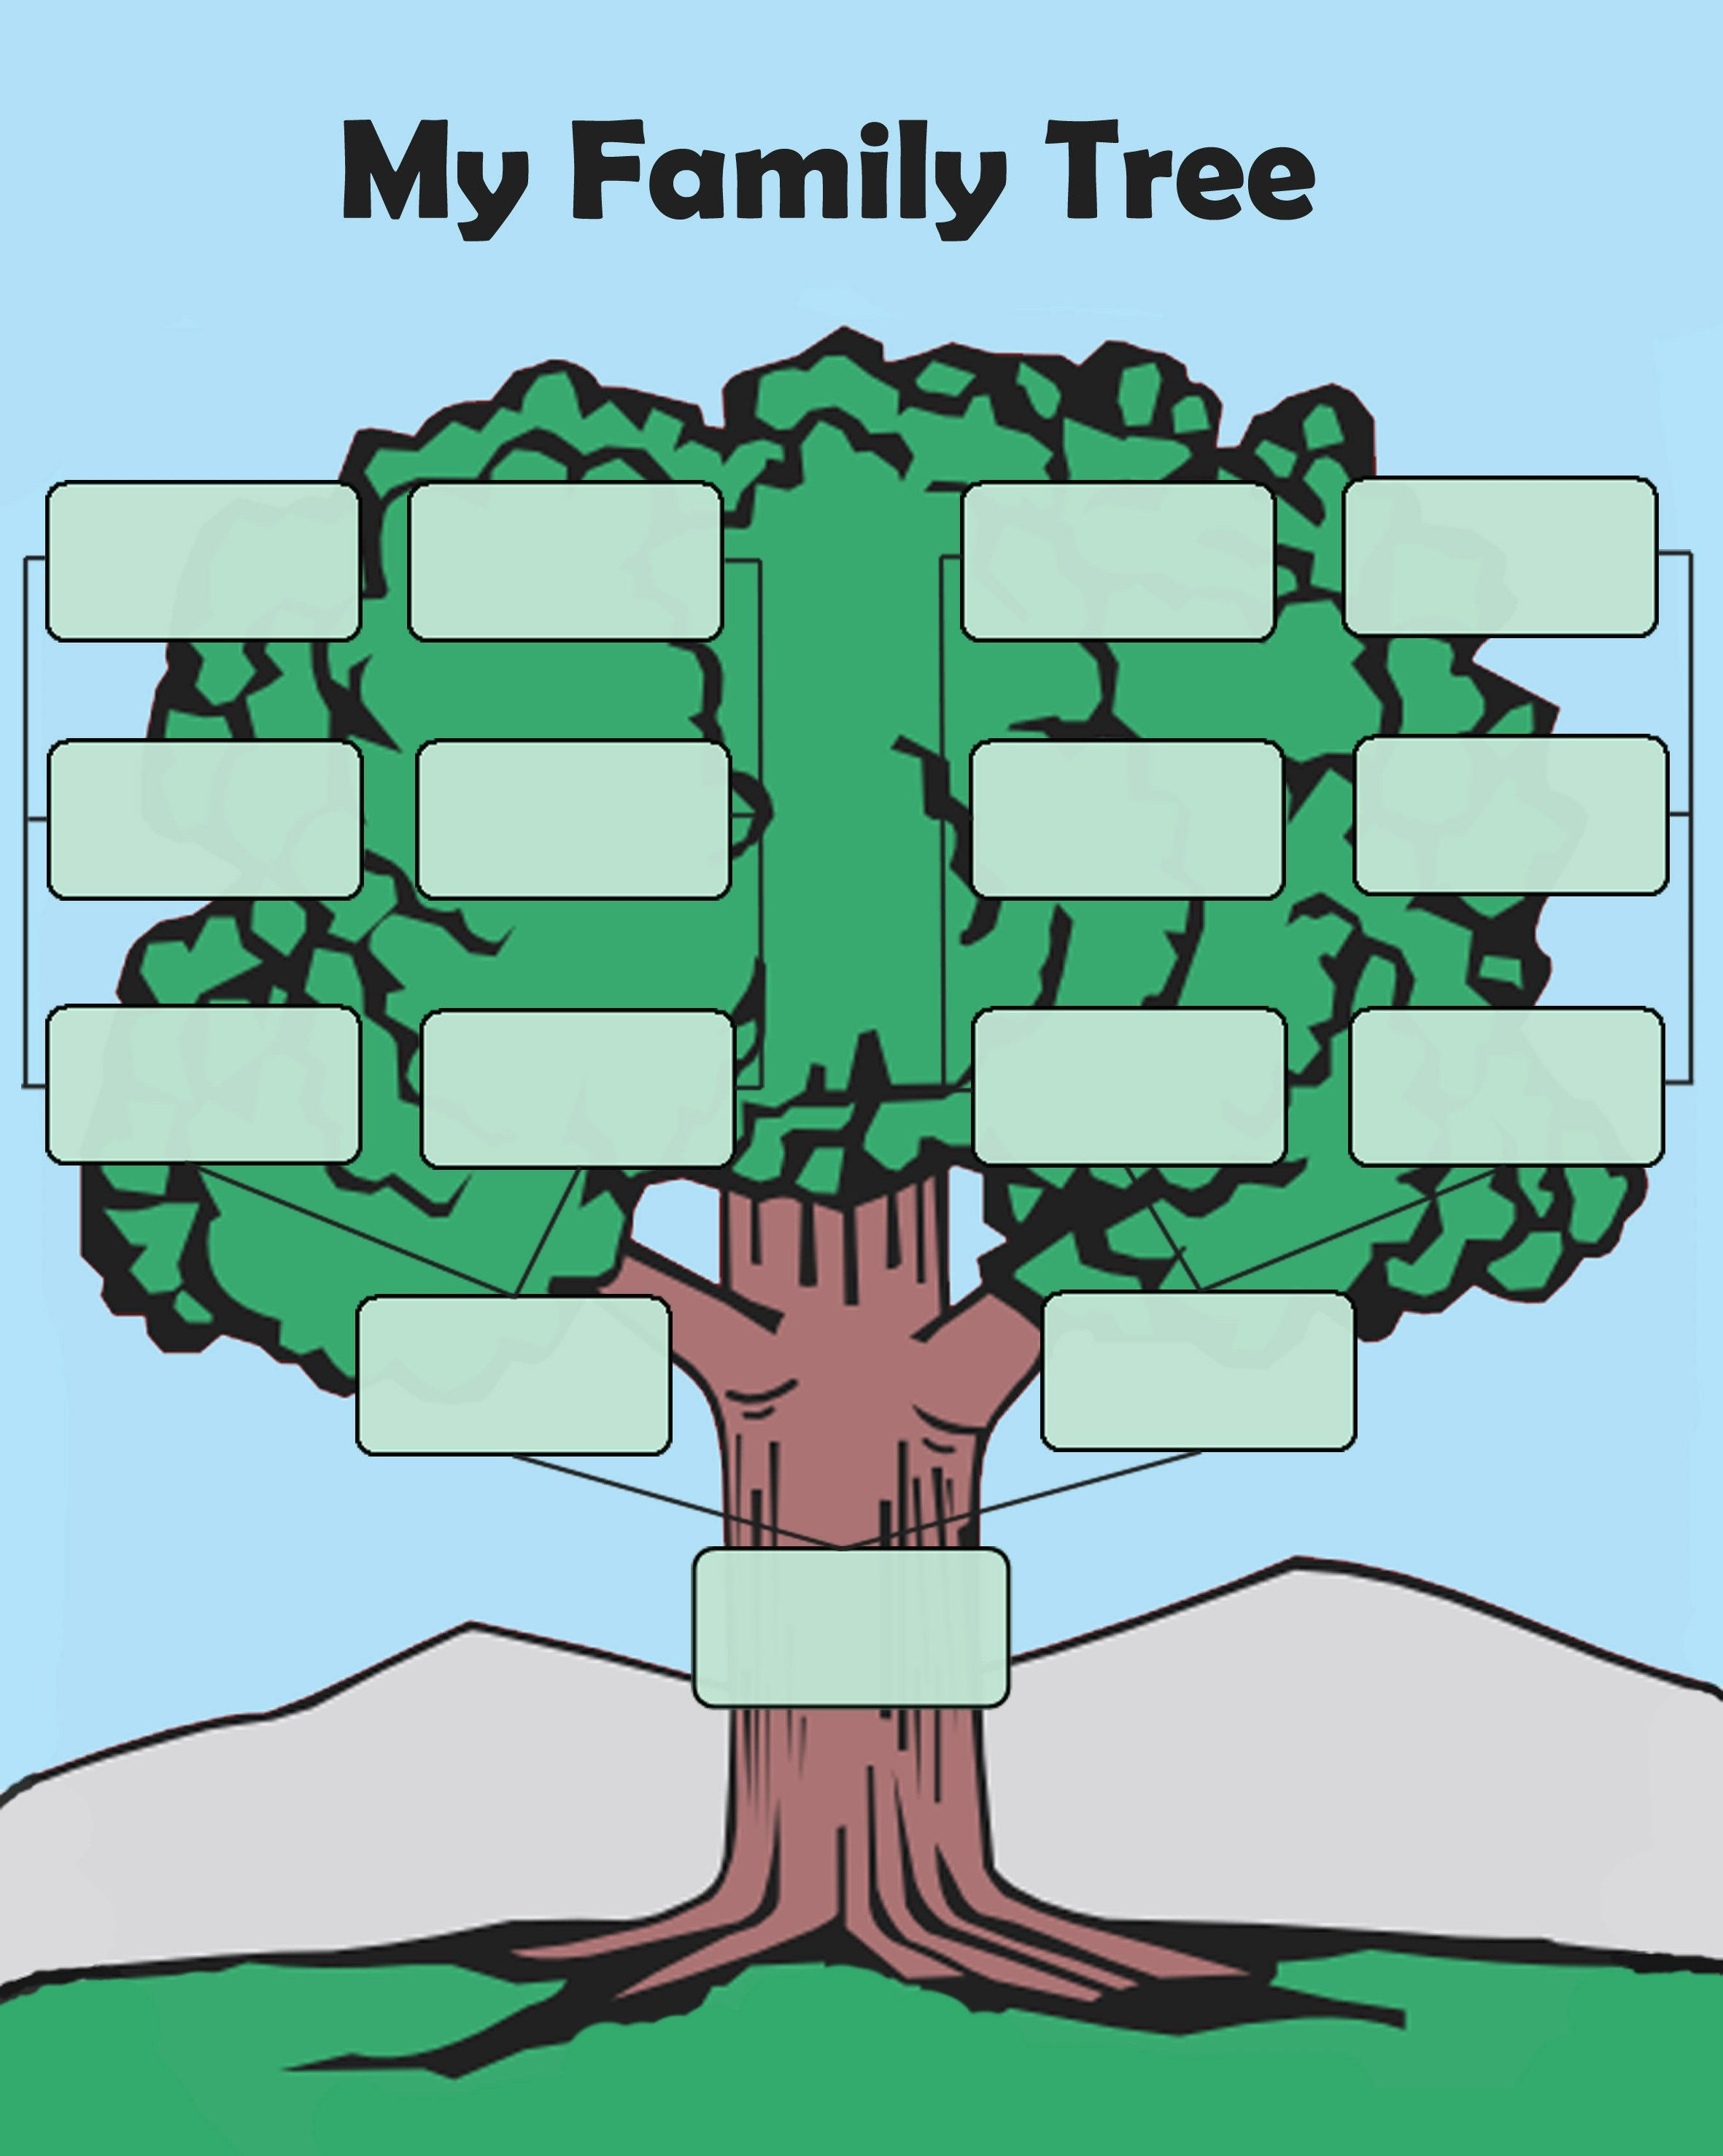 Free Family Tree Templates Inspirational Free Editable Family Tree Template Daily Roabox